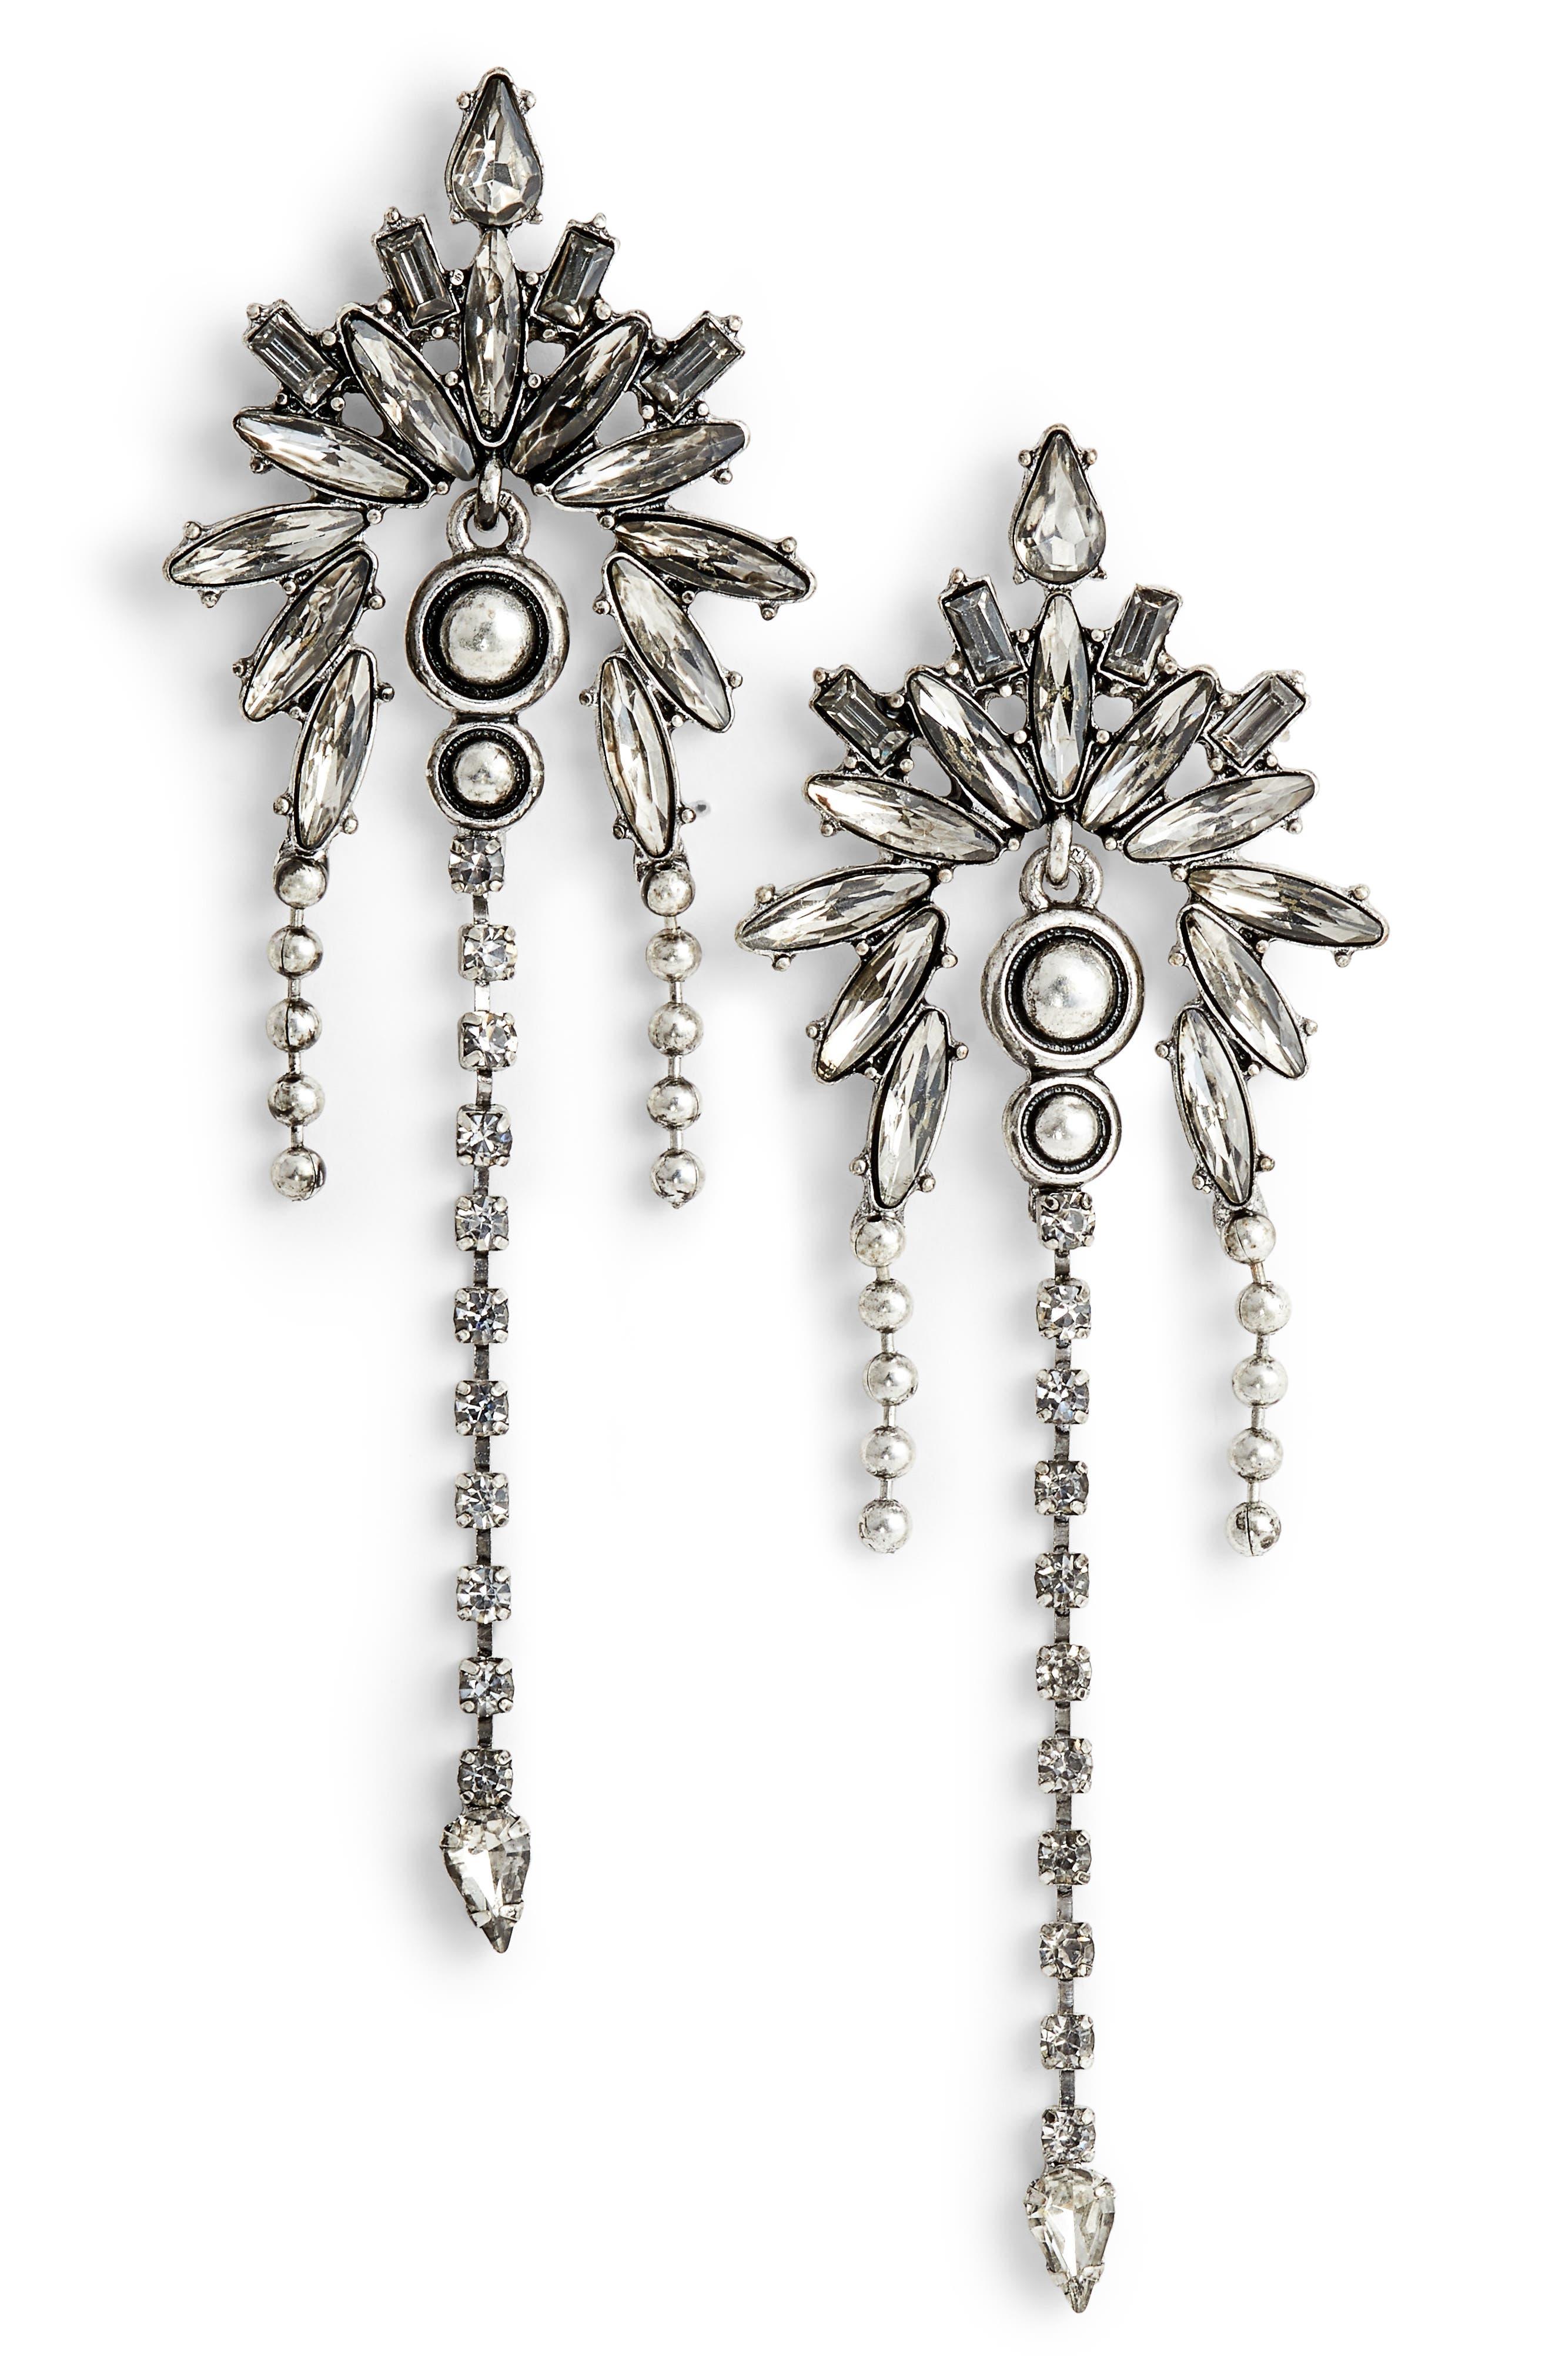 DLNLX BY DYLANLEX Crystal Chandelier Earrings